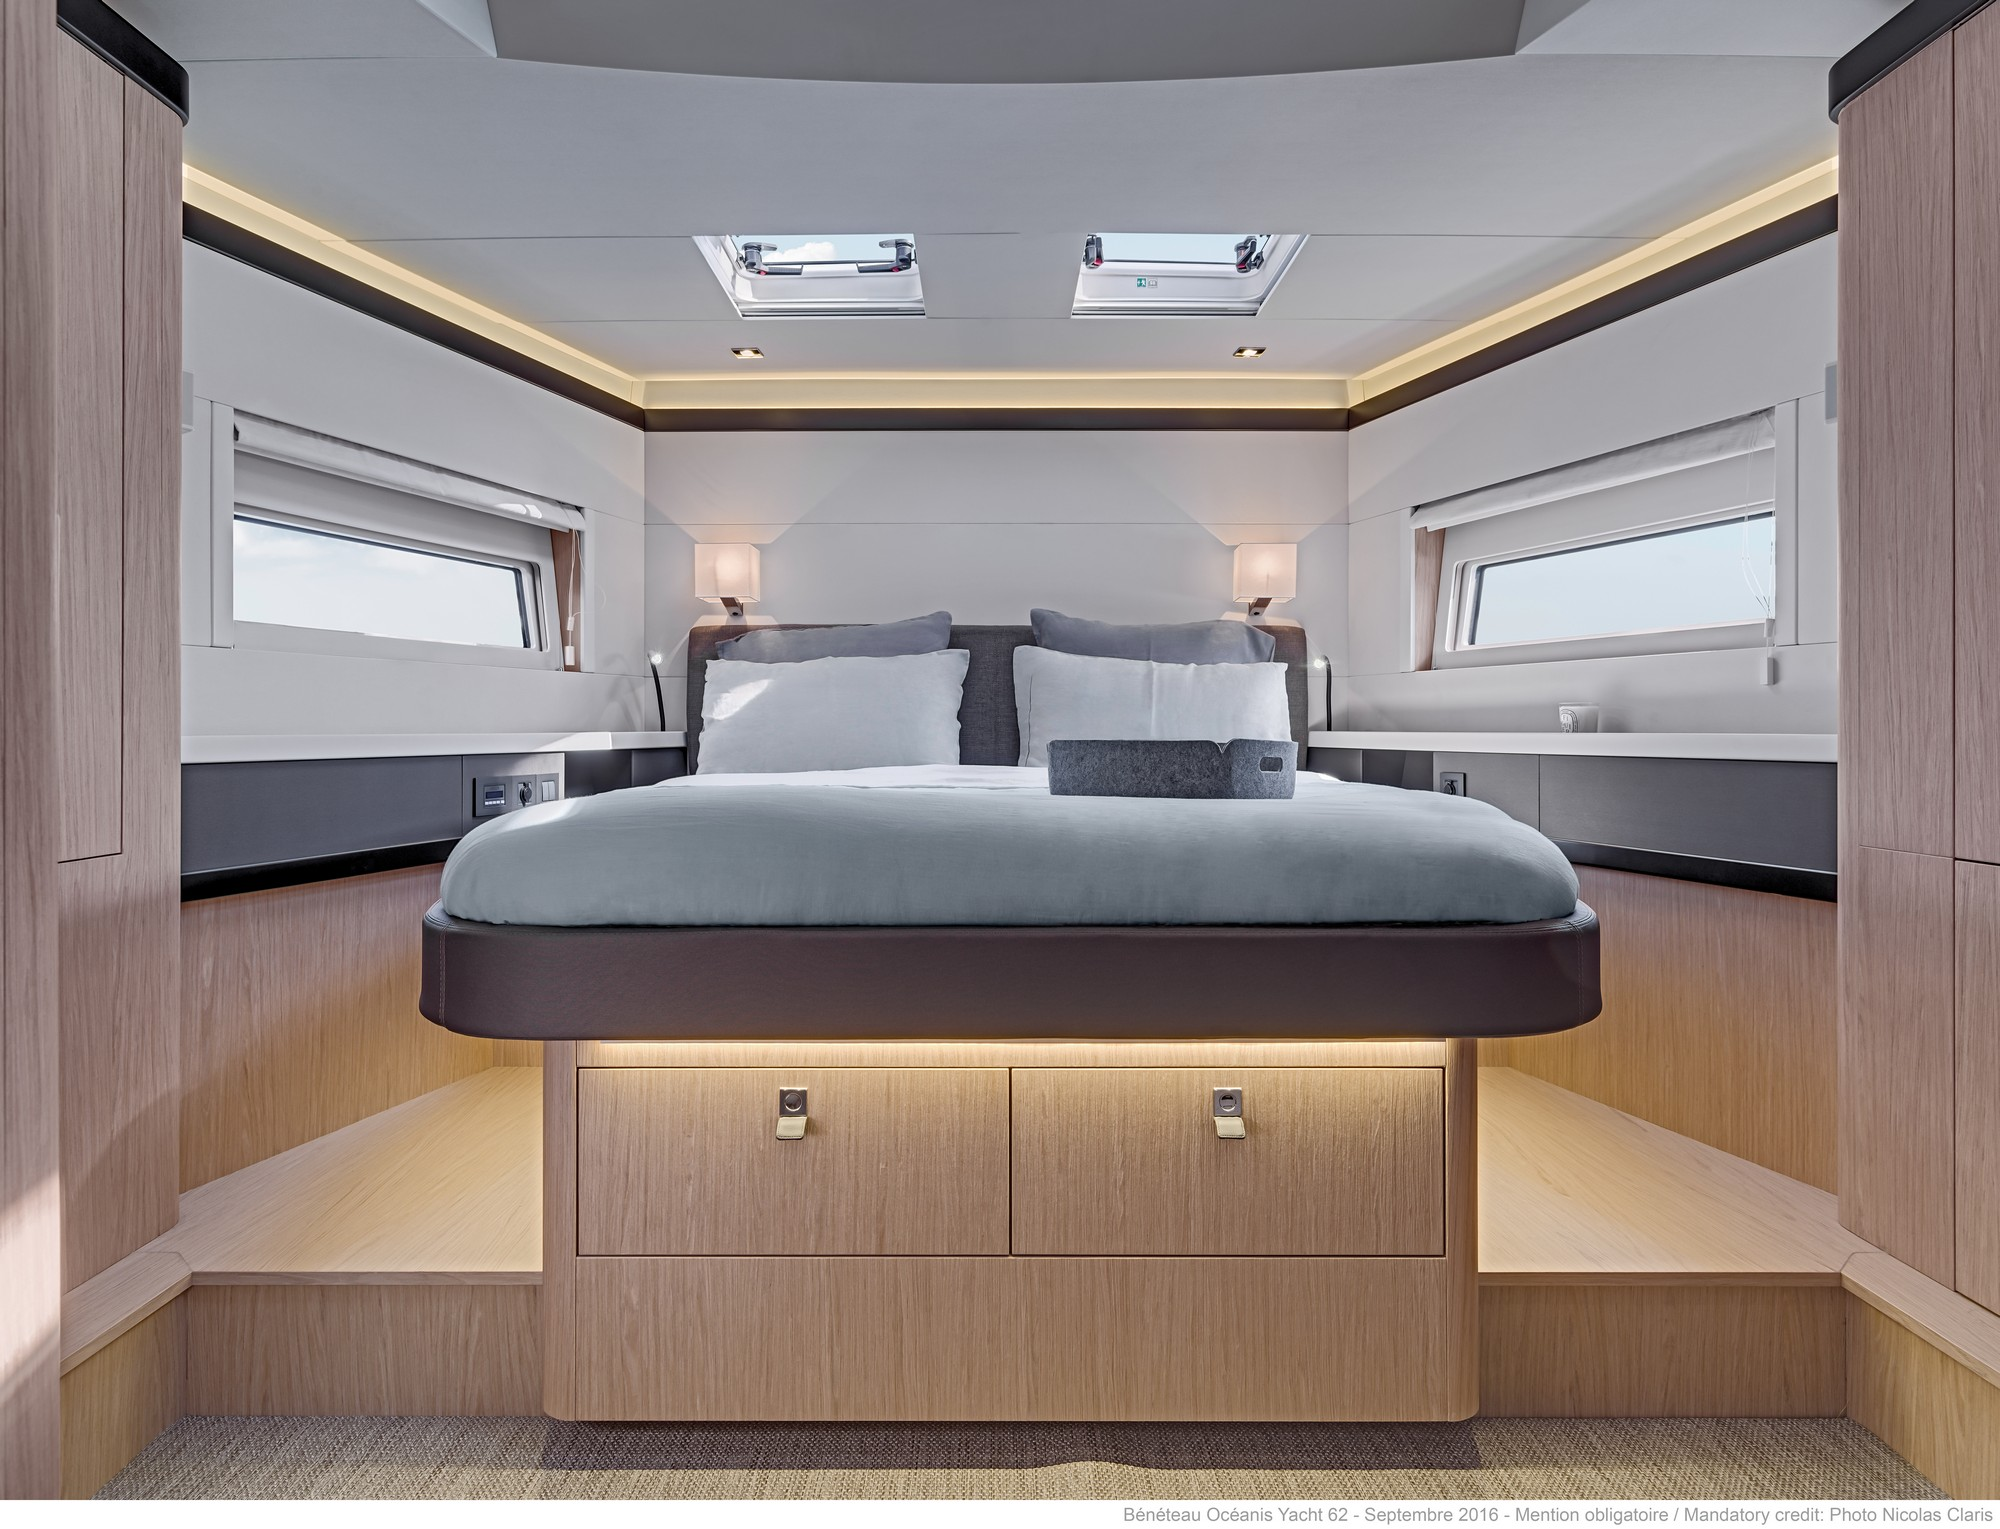 Du thuyền Oceanis Yacht 62 1